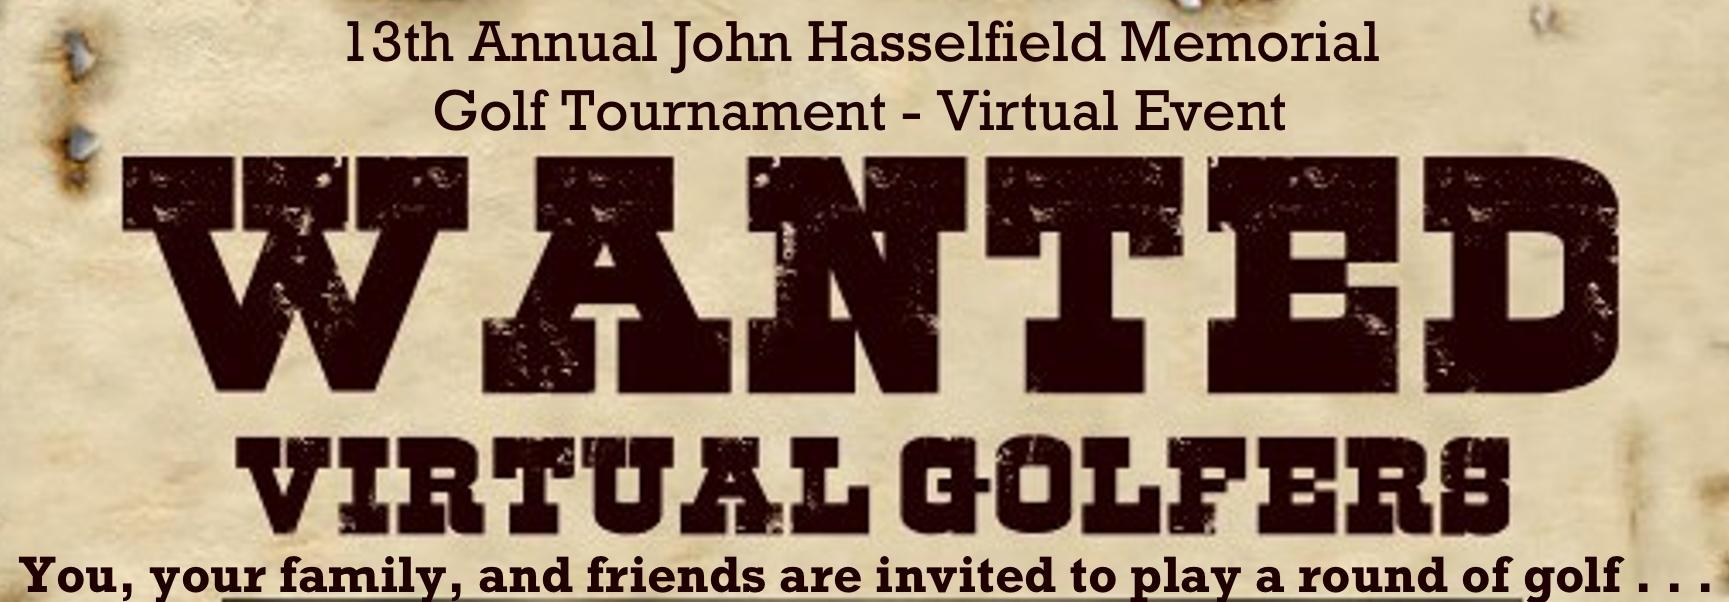 John Hasselfield Endowment Foundation